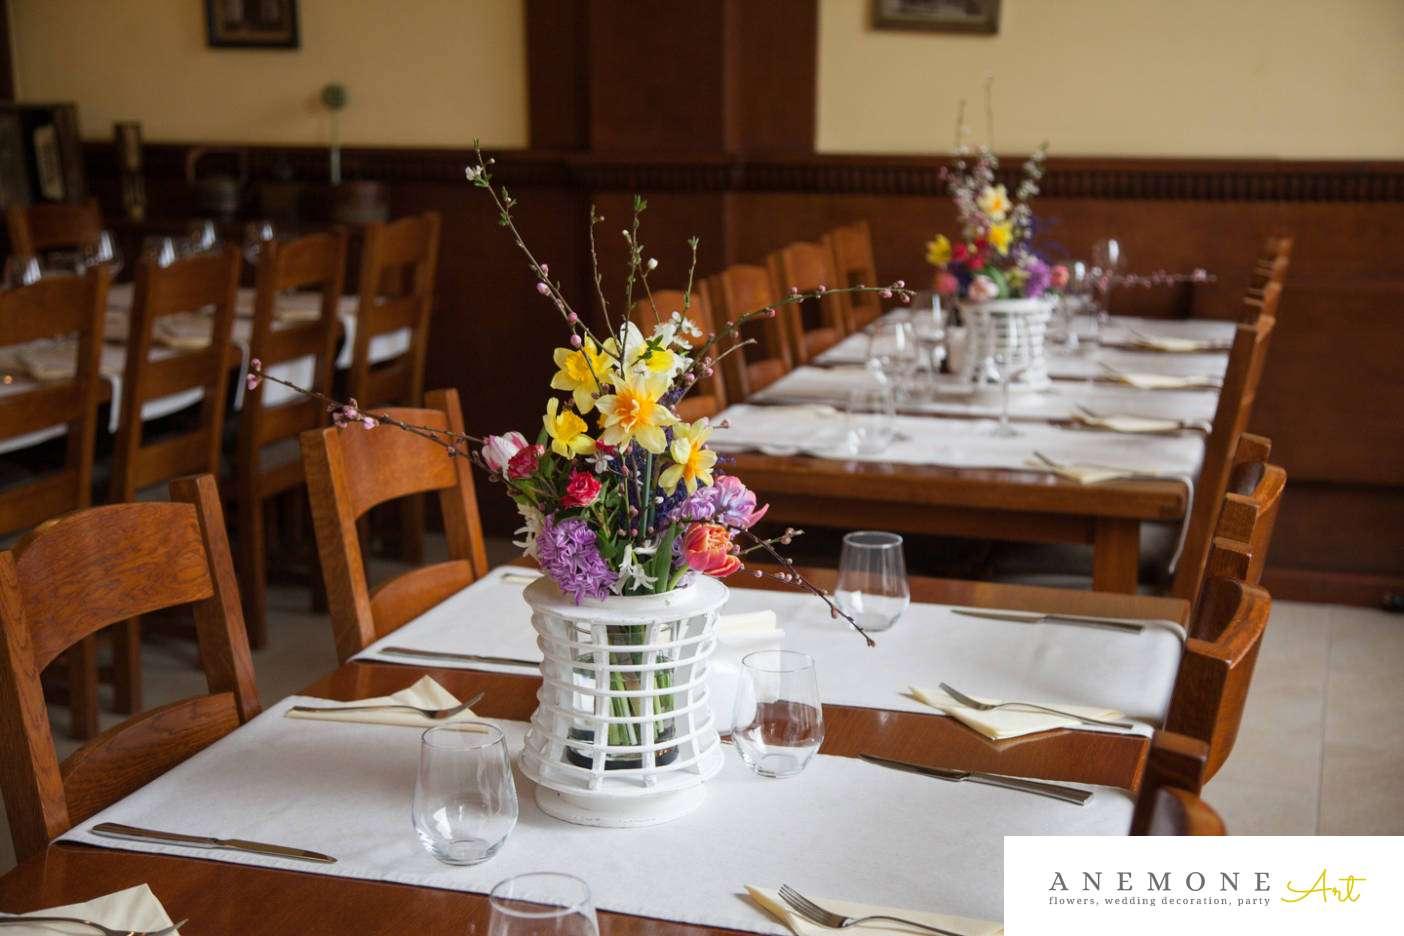 Poza, foto cu Flori de nunta decor masa, restaurant ratio in Arad, Timisoara, Oradea (wedding flowers, bouquets) nunta Arad, Timisoara, Oradea